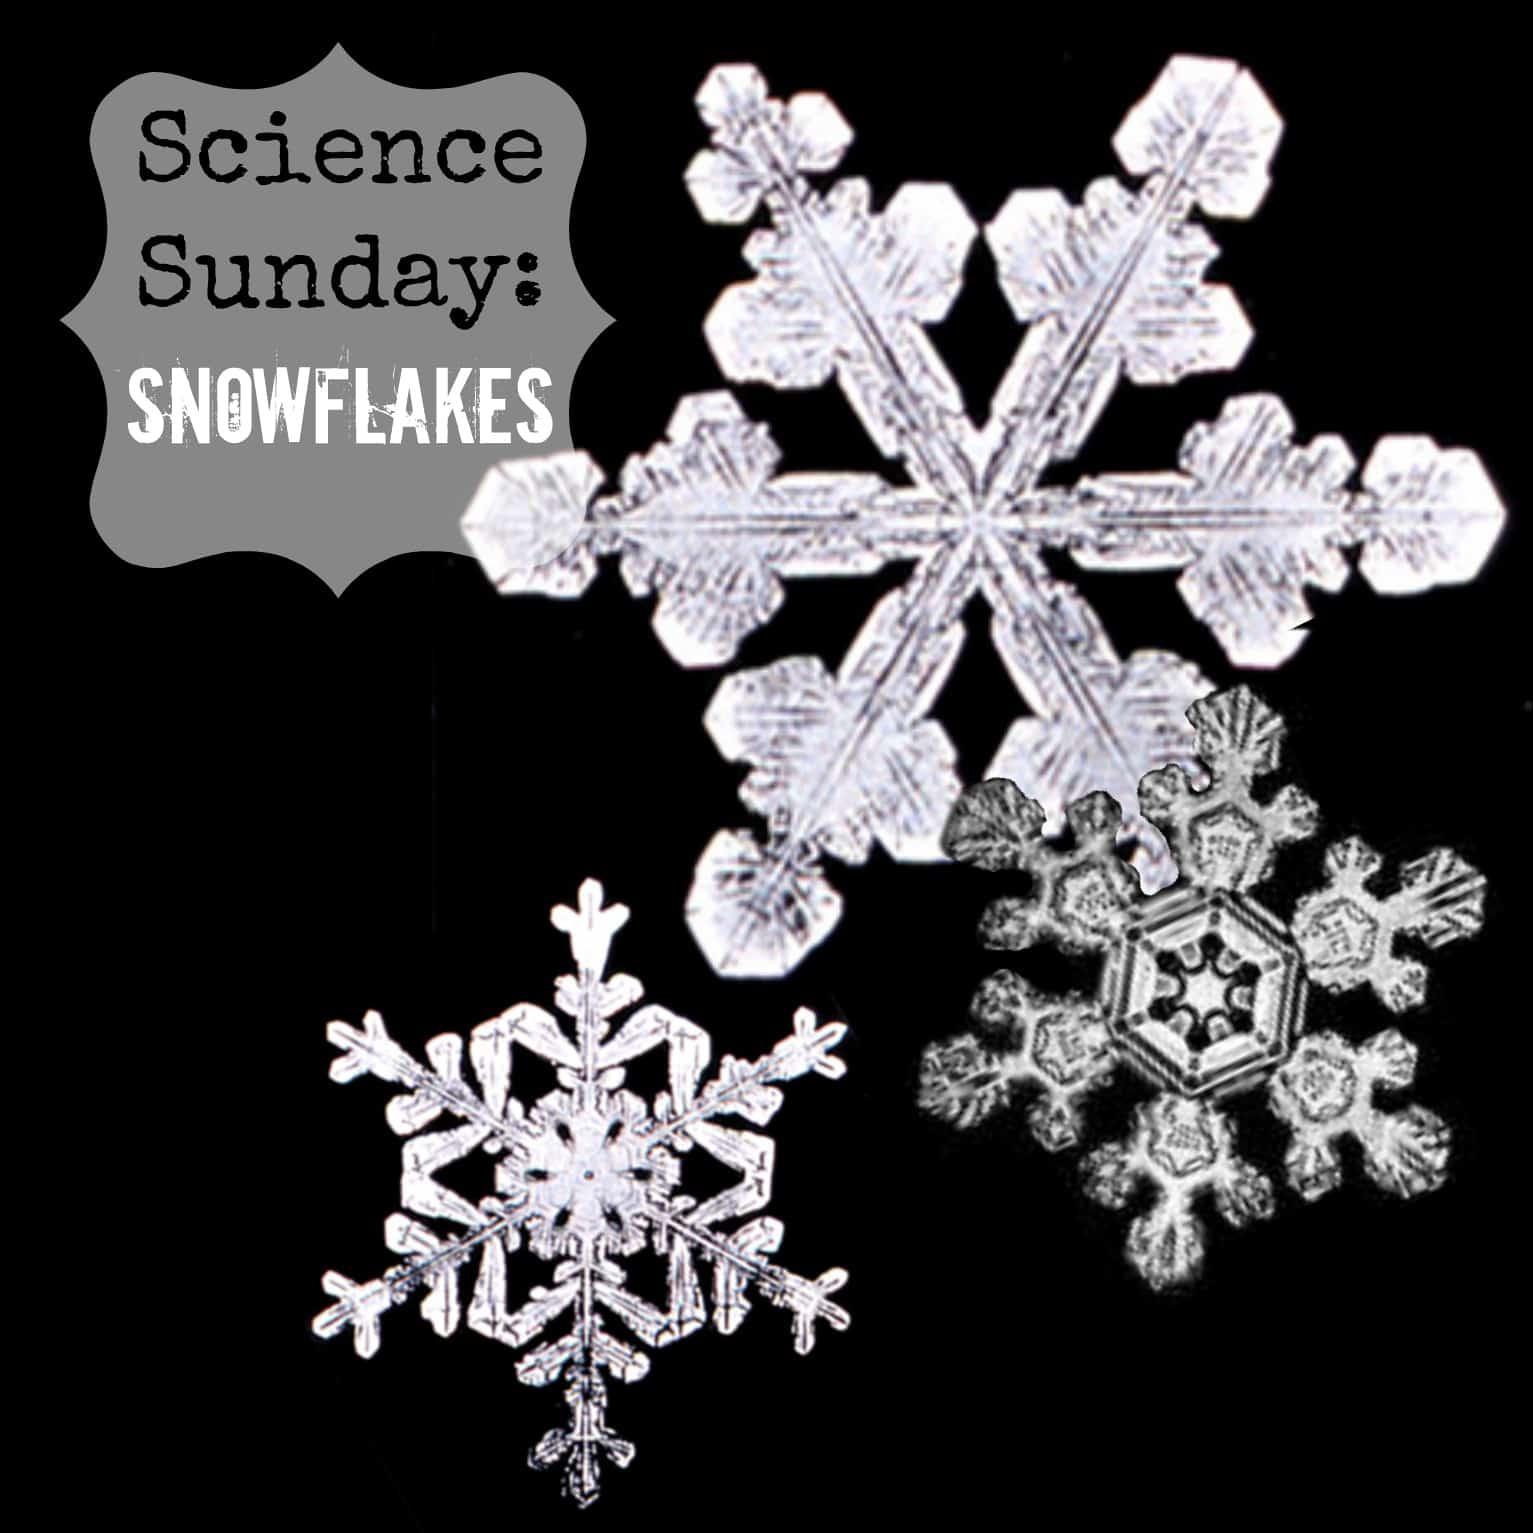 science sunday:  snowflakes